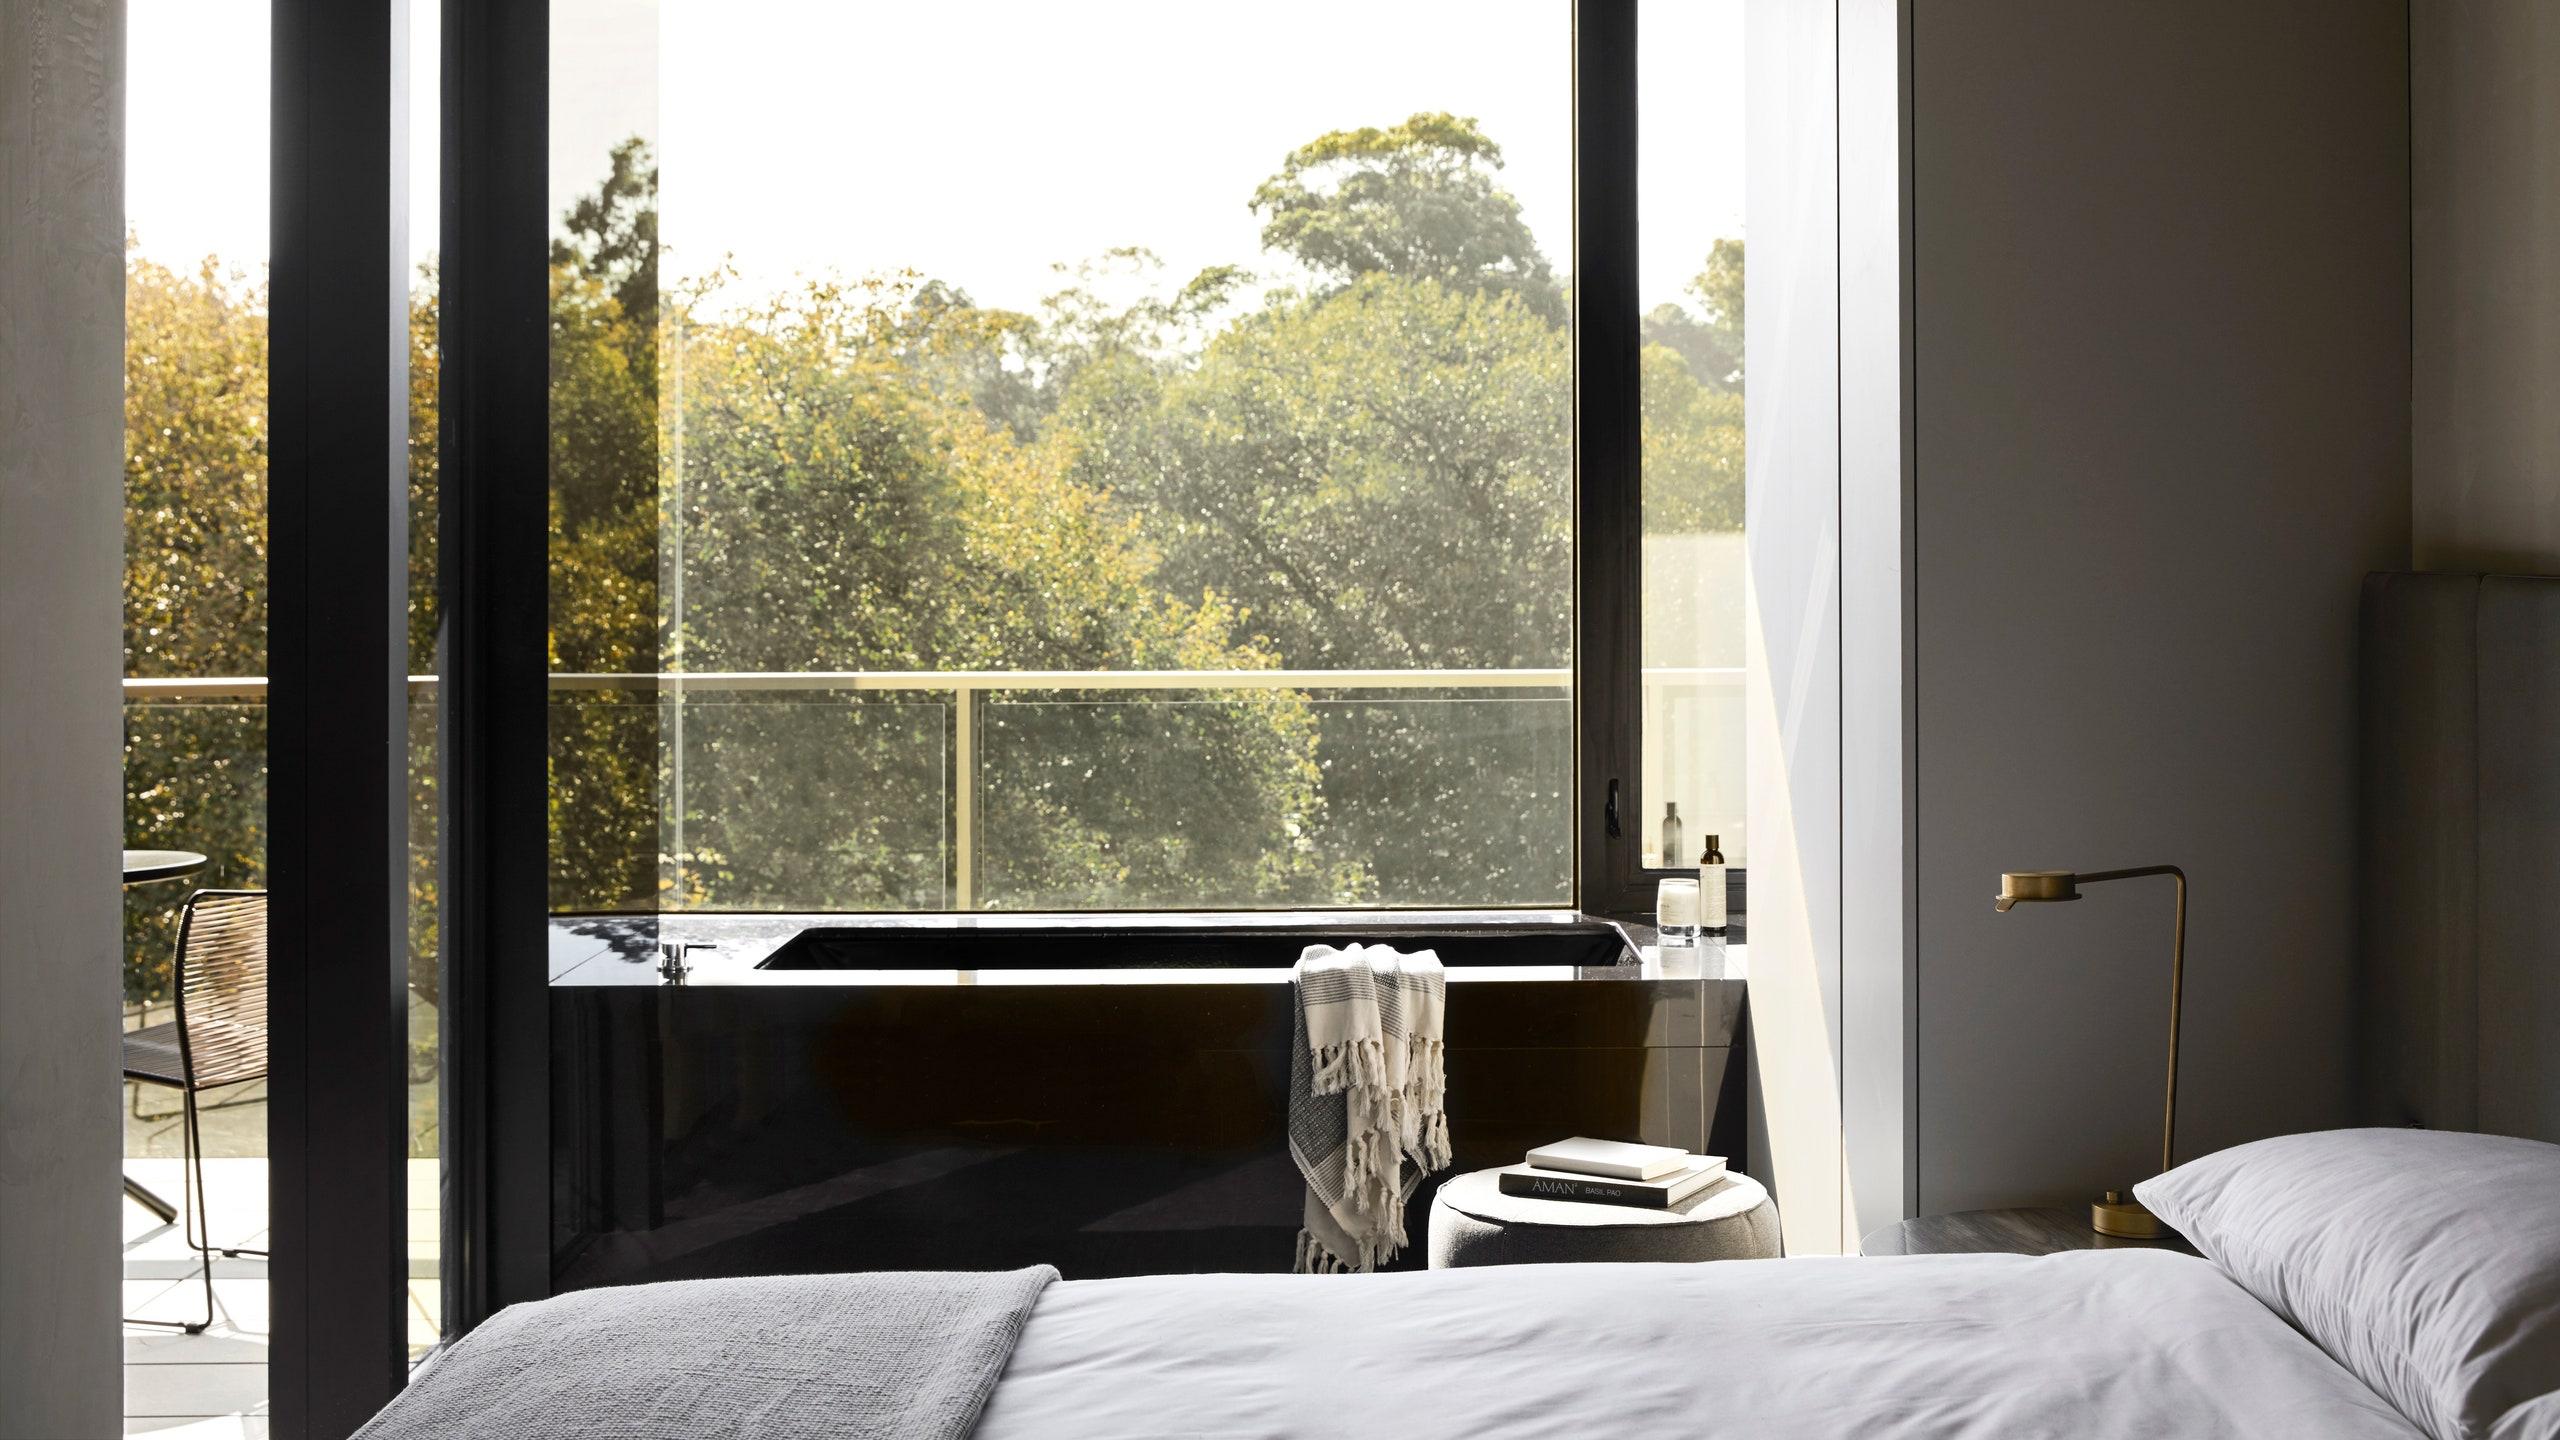 United Places Botanic Gardens - Design conscious hotel Melbourne